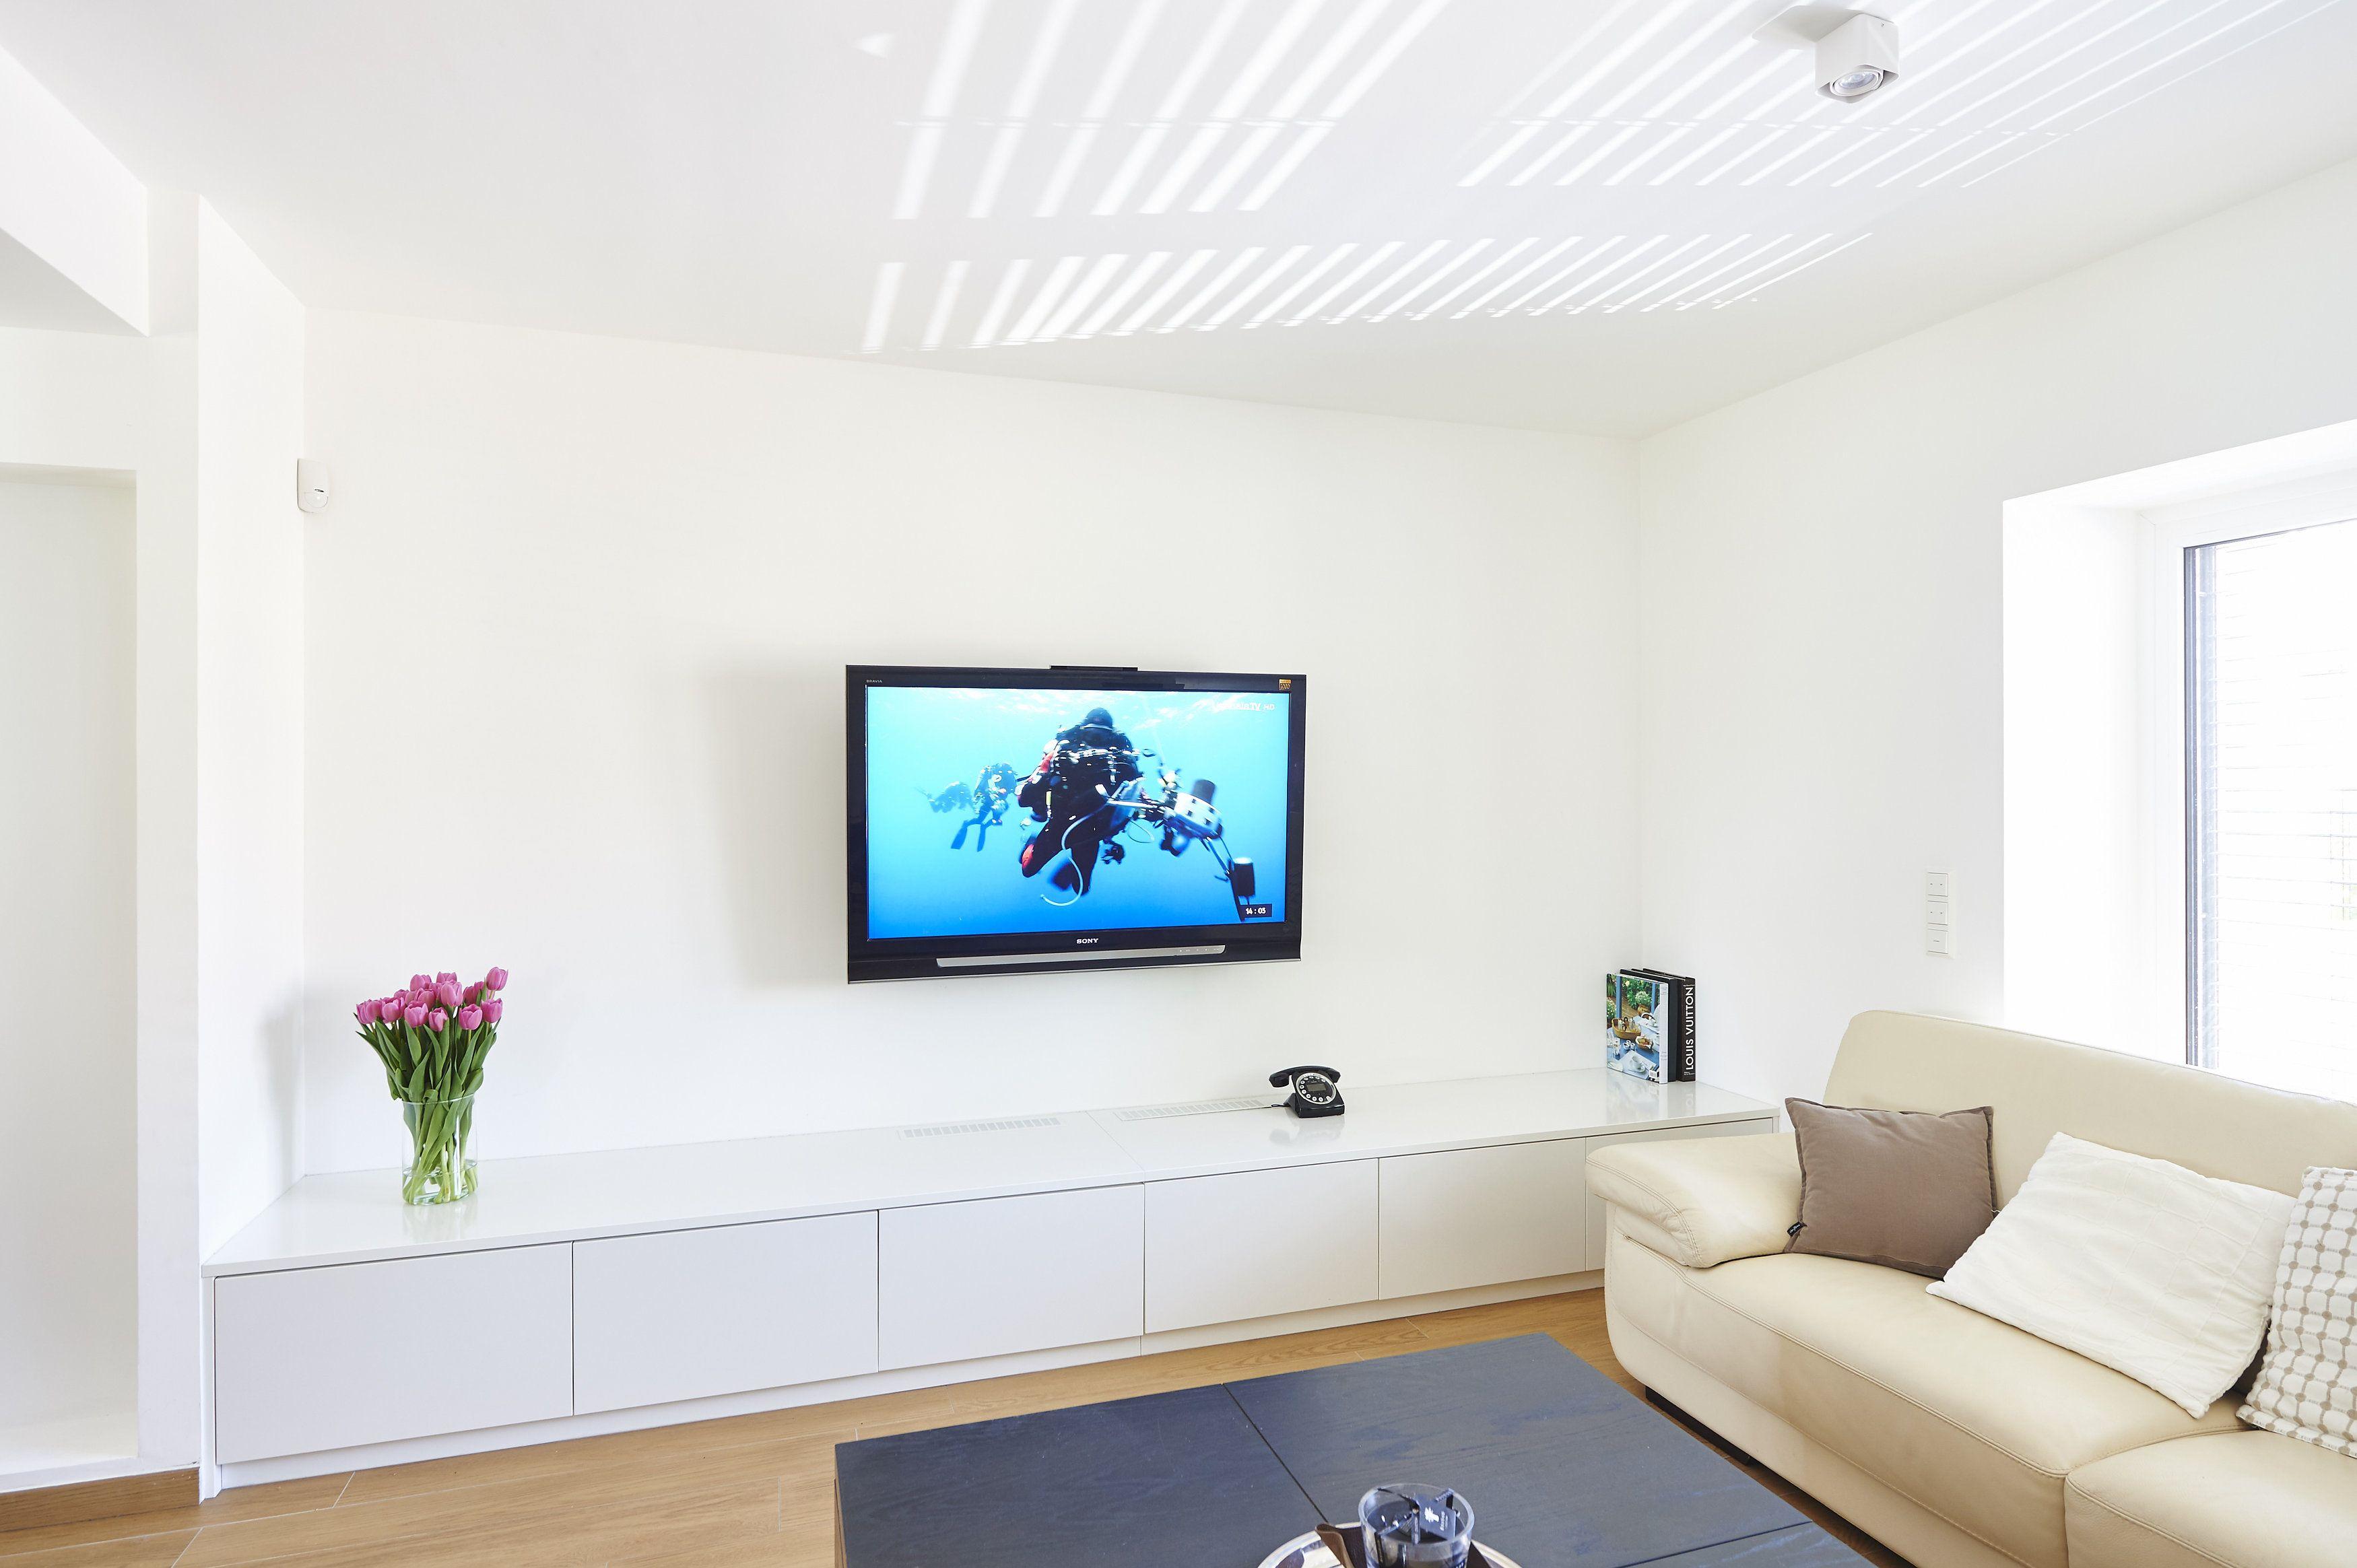 Meuble tv bas blanc design meuble tv tv meubel meuble bas salon meuble bas meuble tv - Meuble bas ikea salon ...